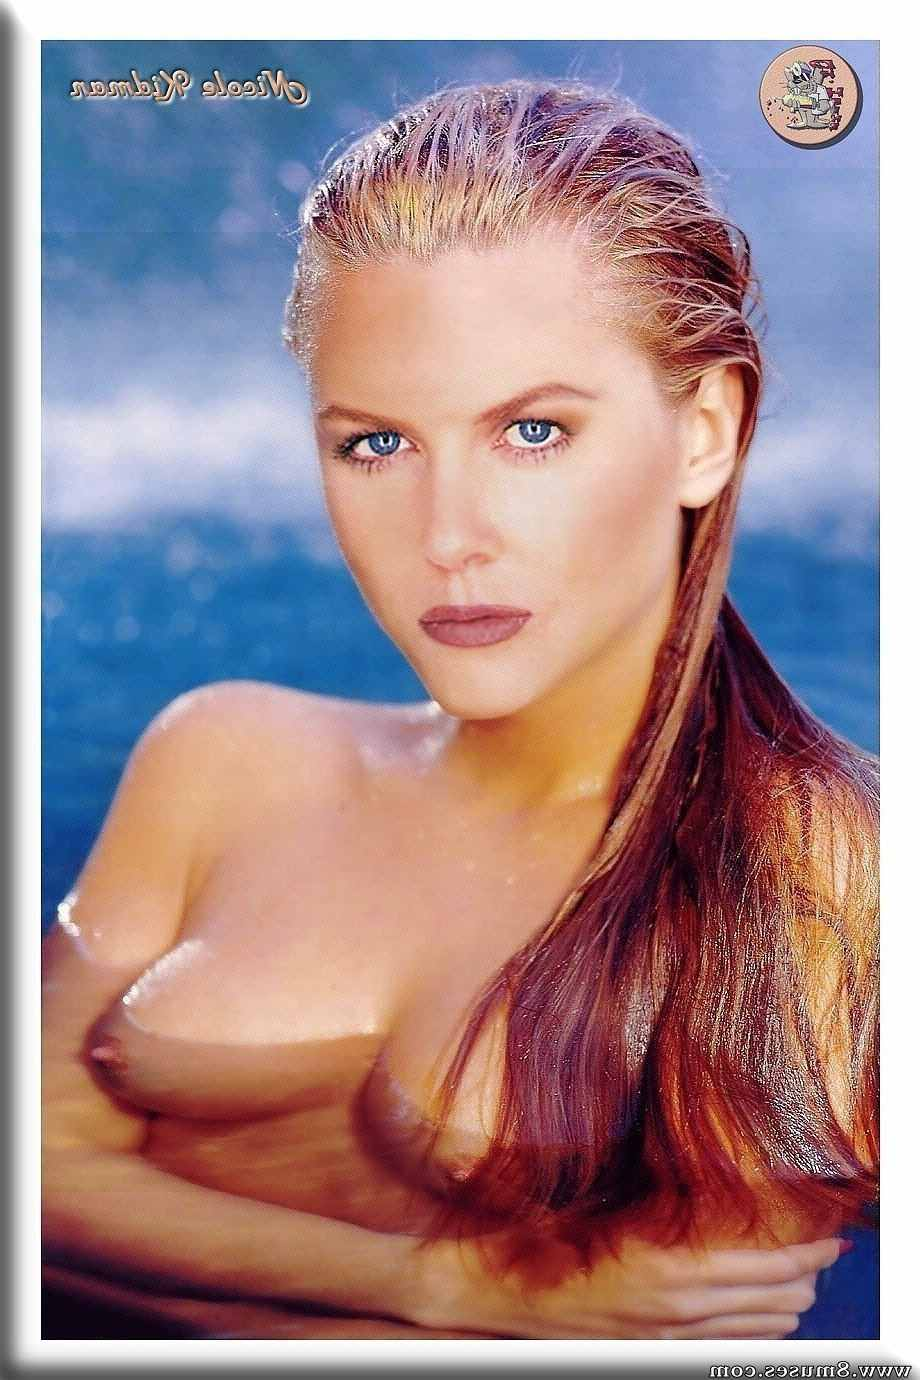 Fake-Celebrities-Sex-Pictures/Nicole-Kidman Nicole_Kidman__8muses_-_Sex_and_Porn_Comics_467.jpg